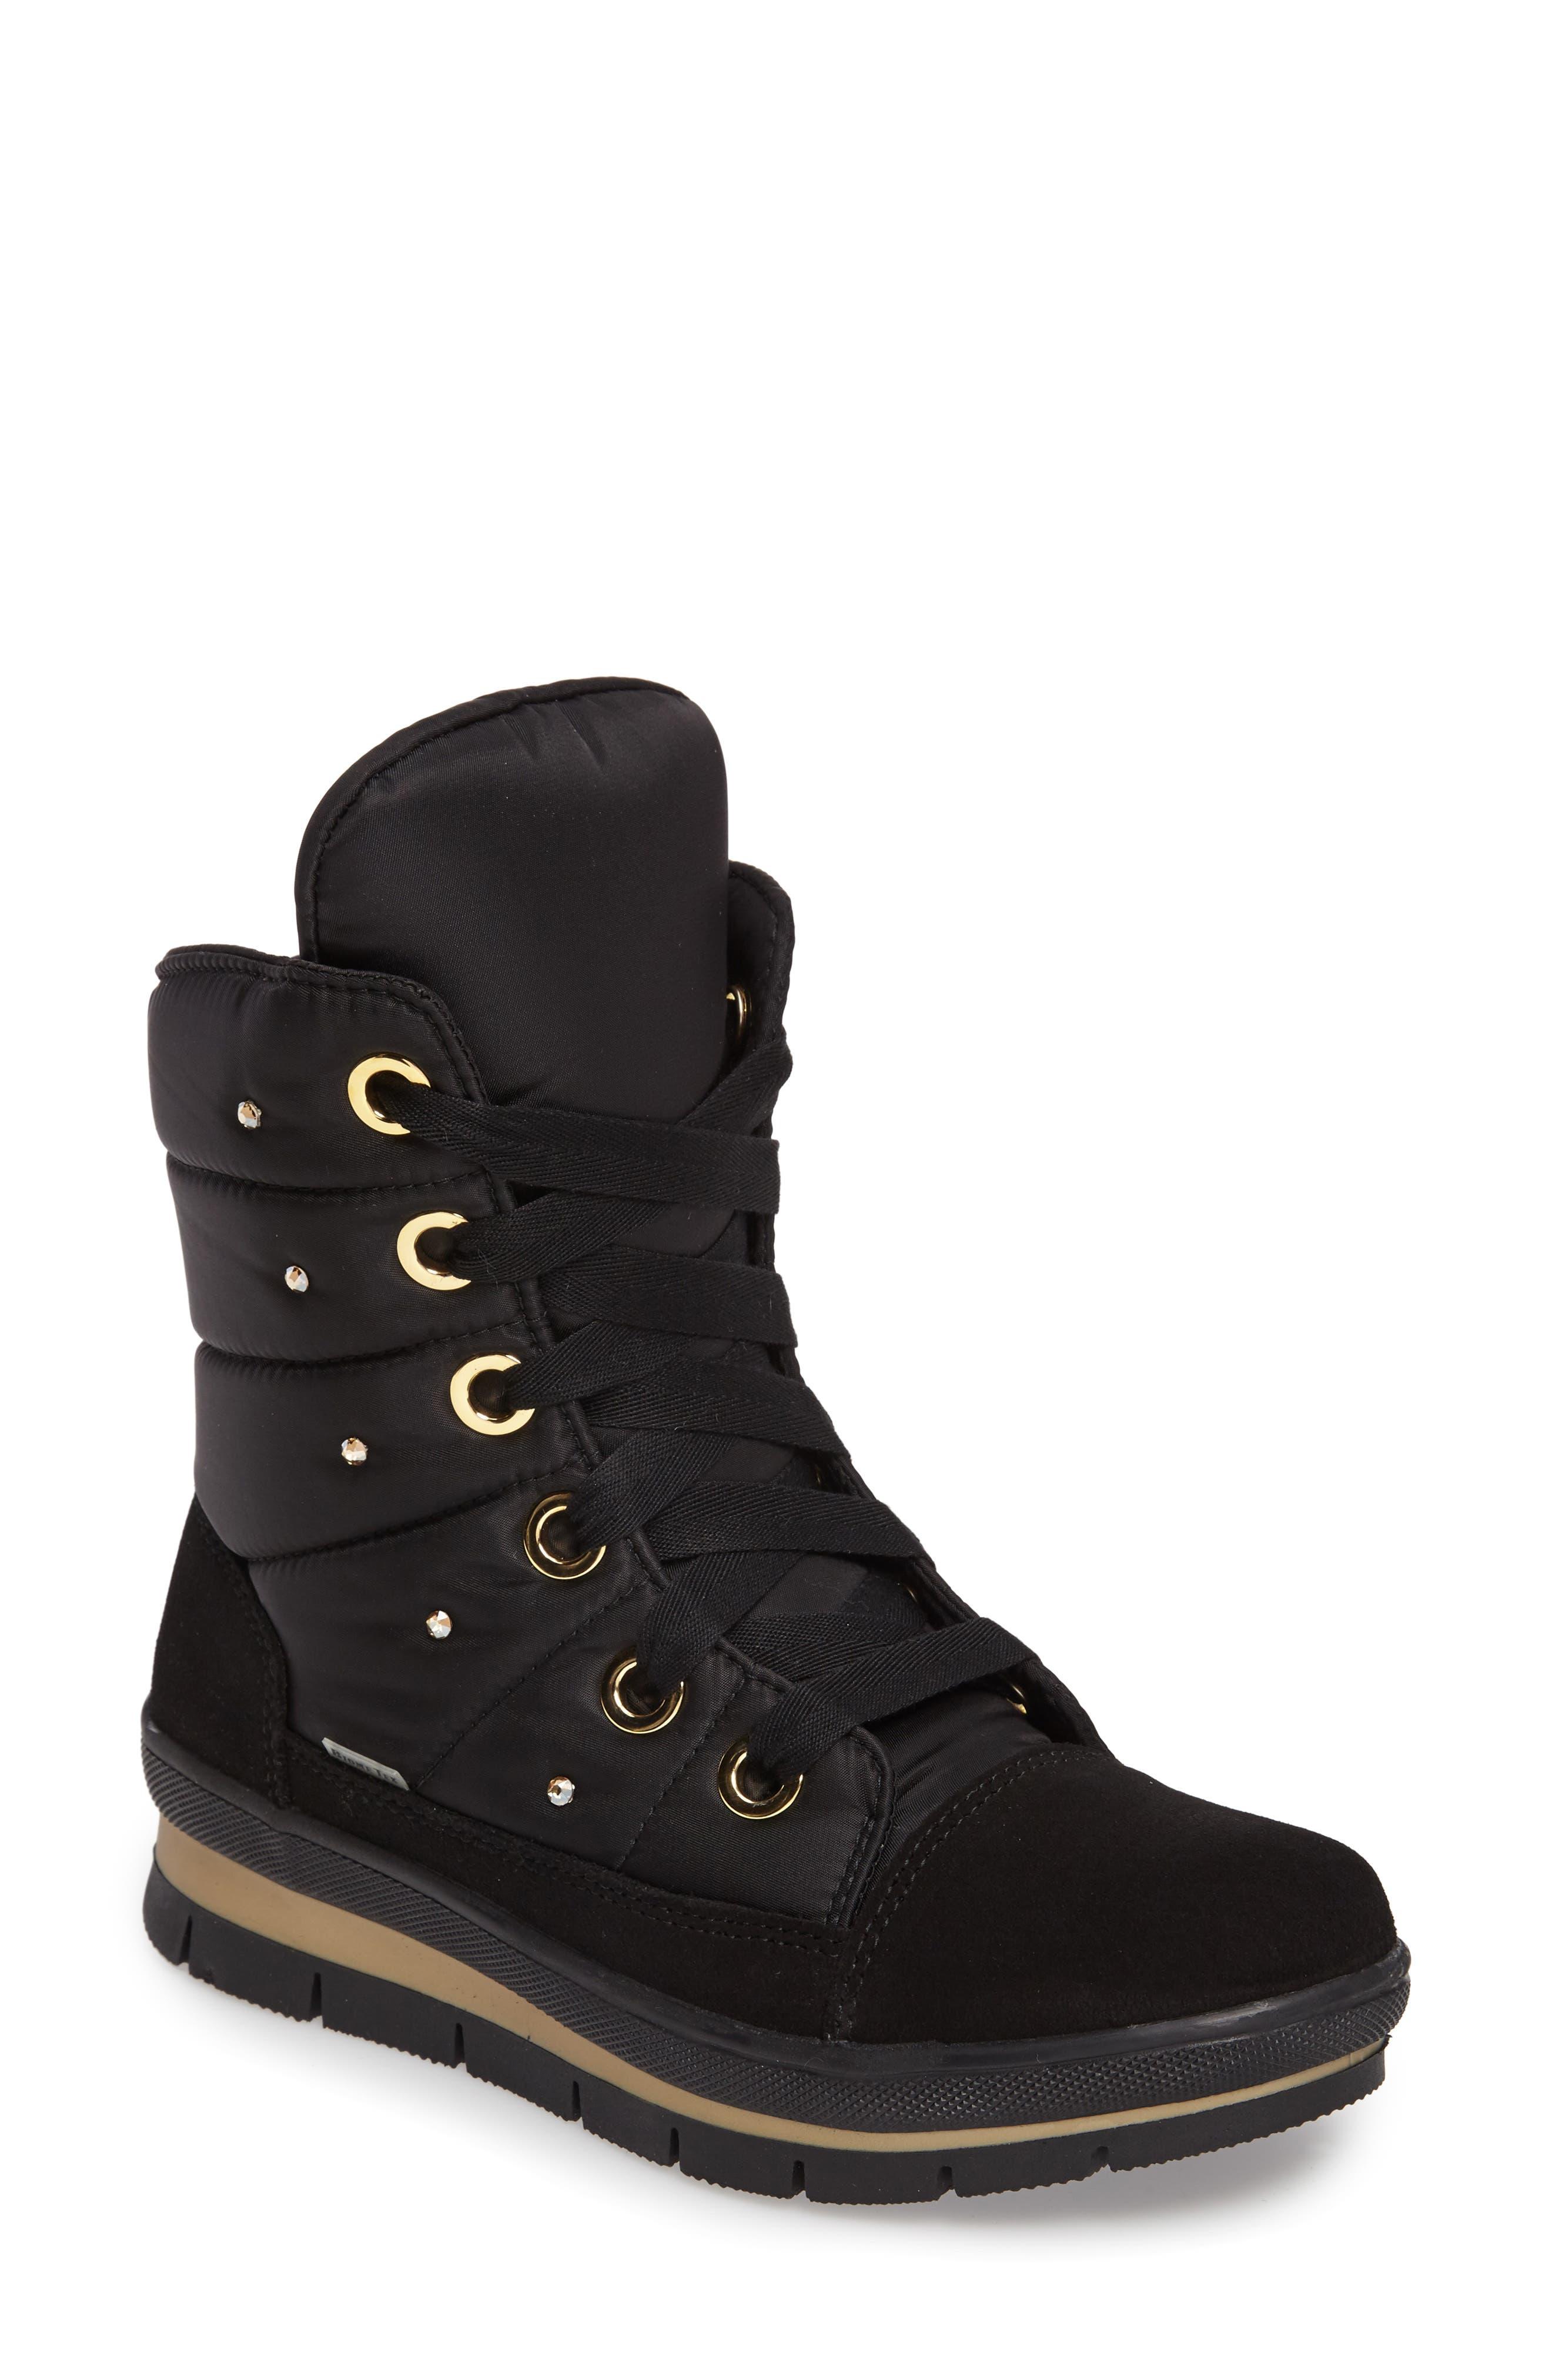 JOG DOG Verbier Waterproof Boot (Women)